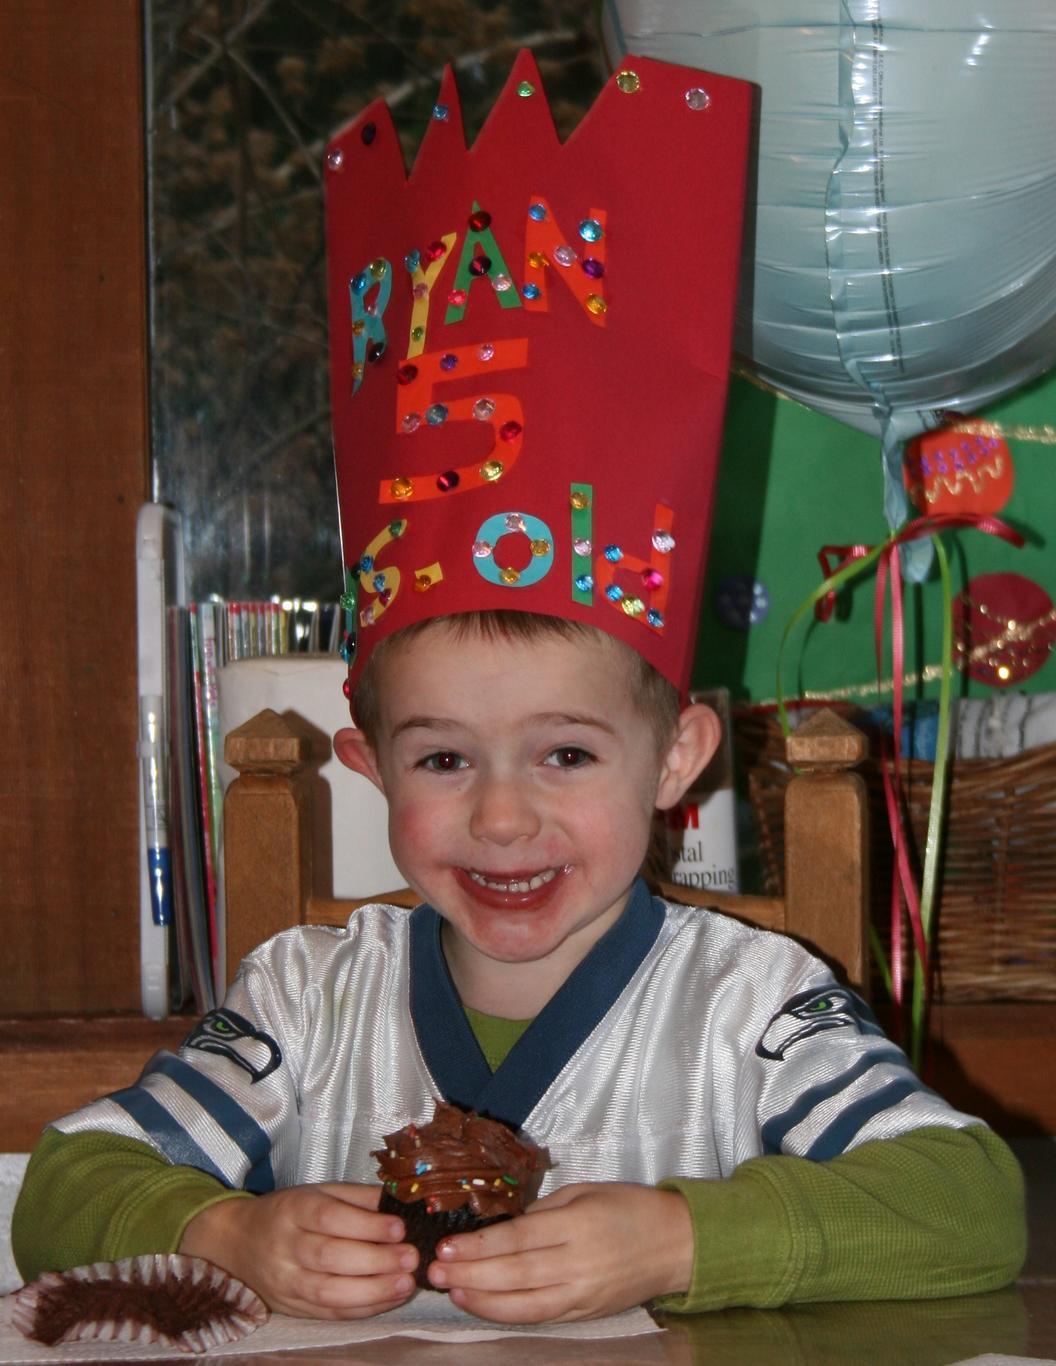 Boy celebrates his birthday